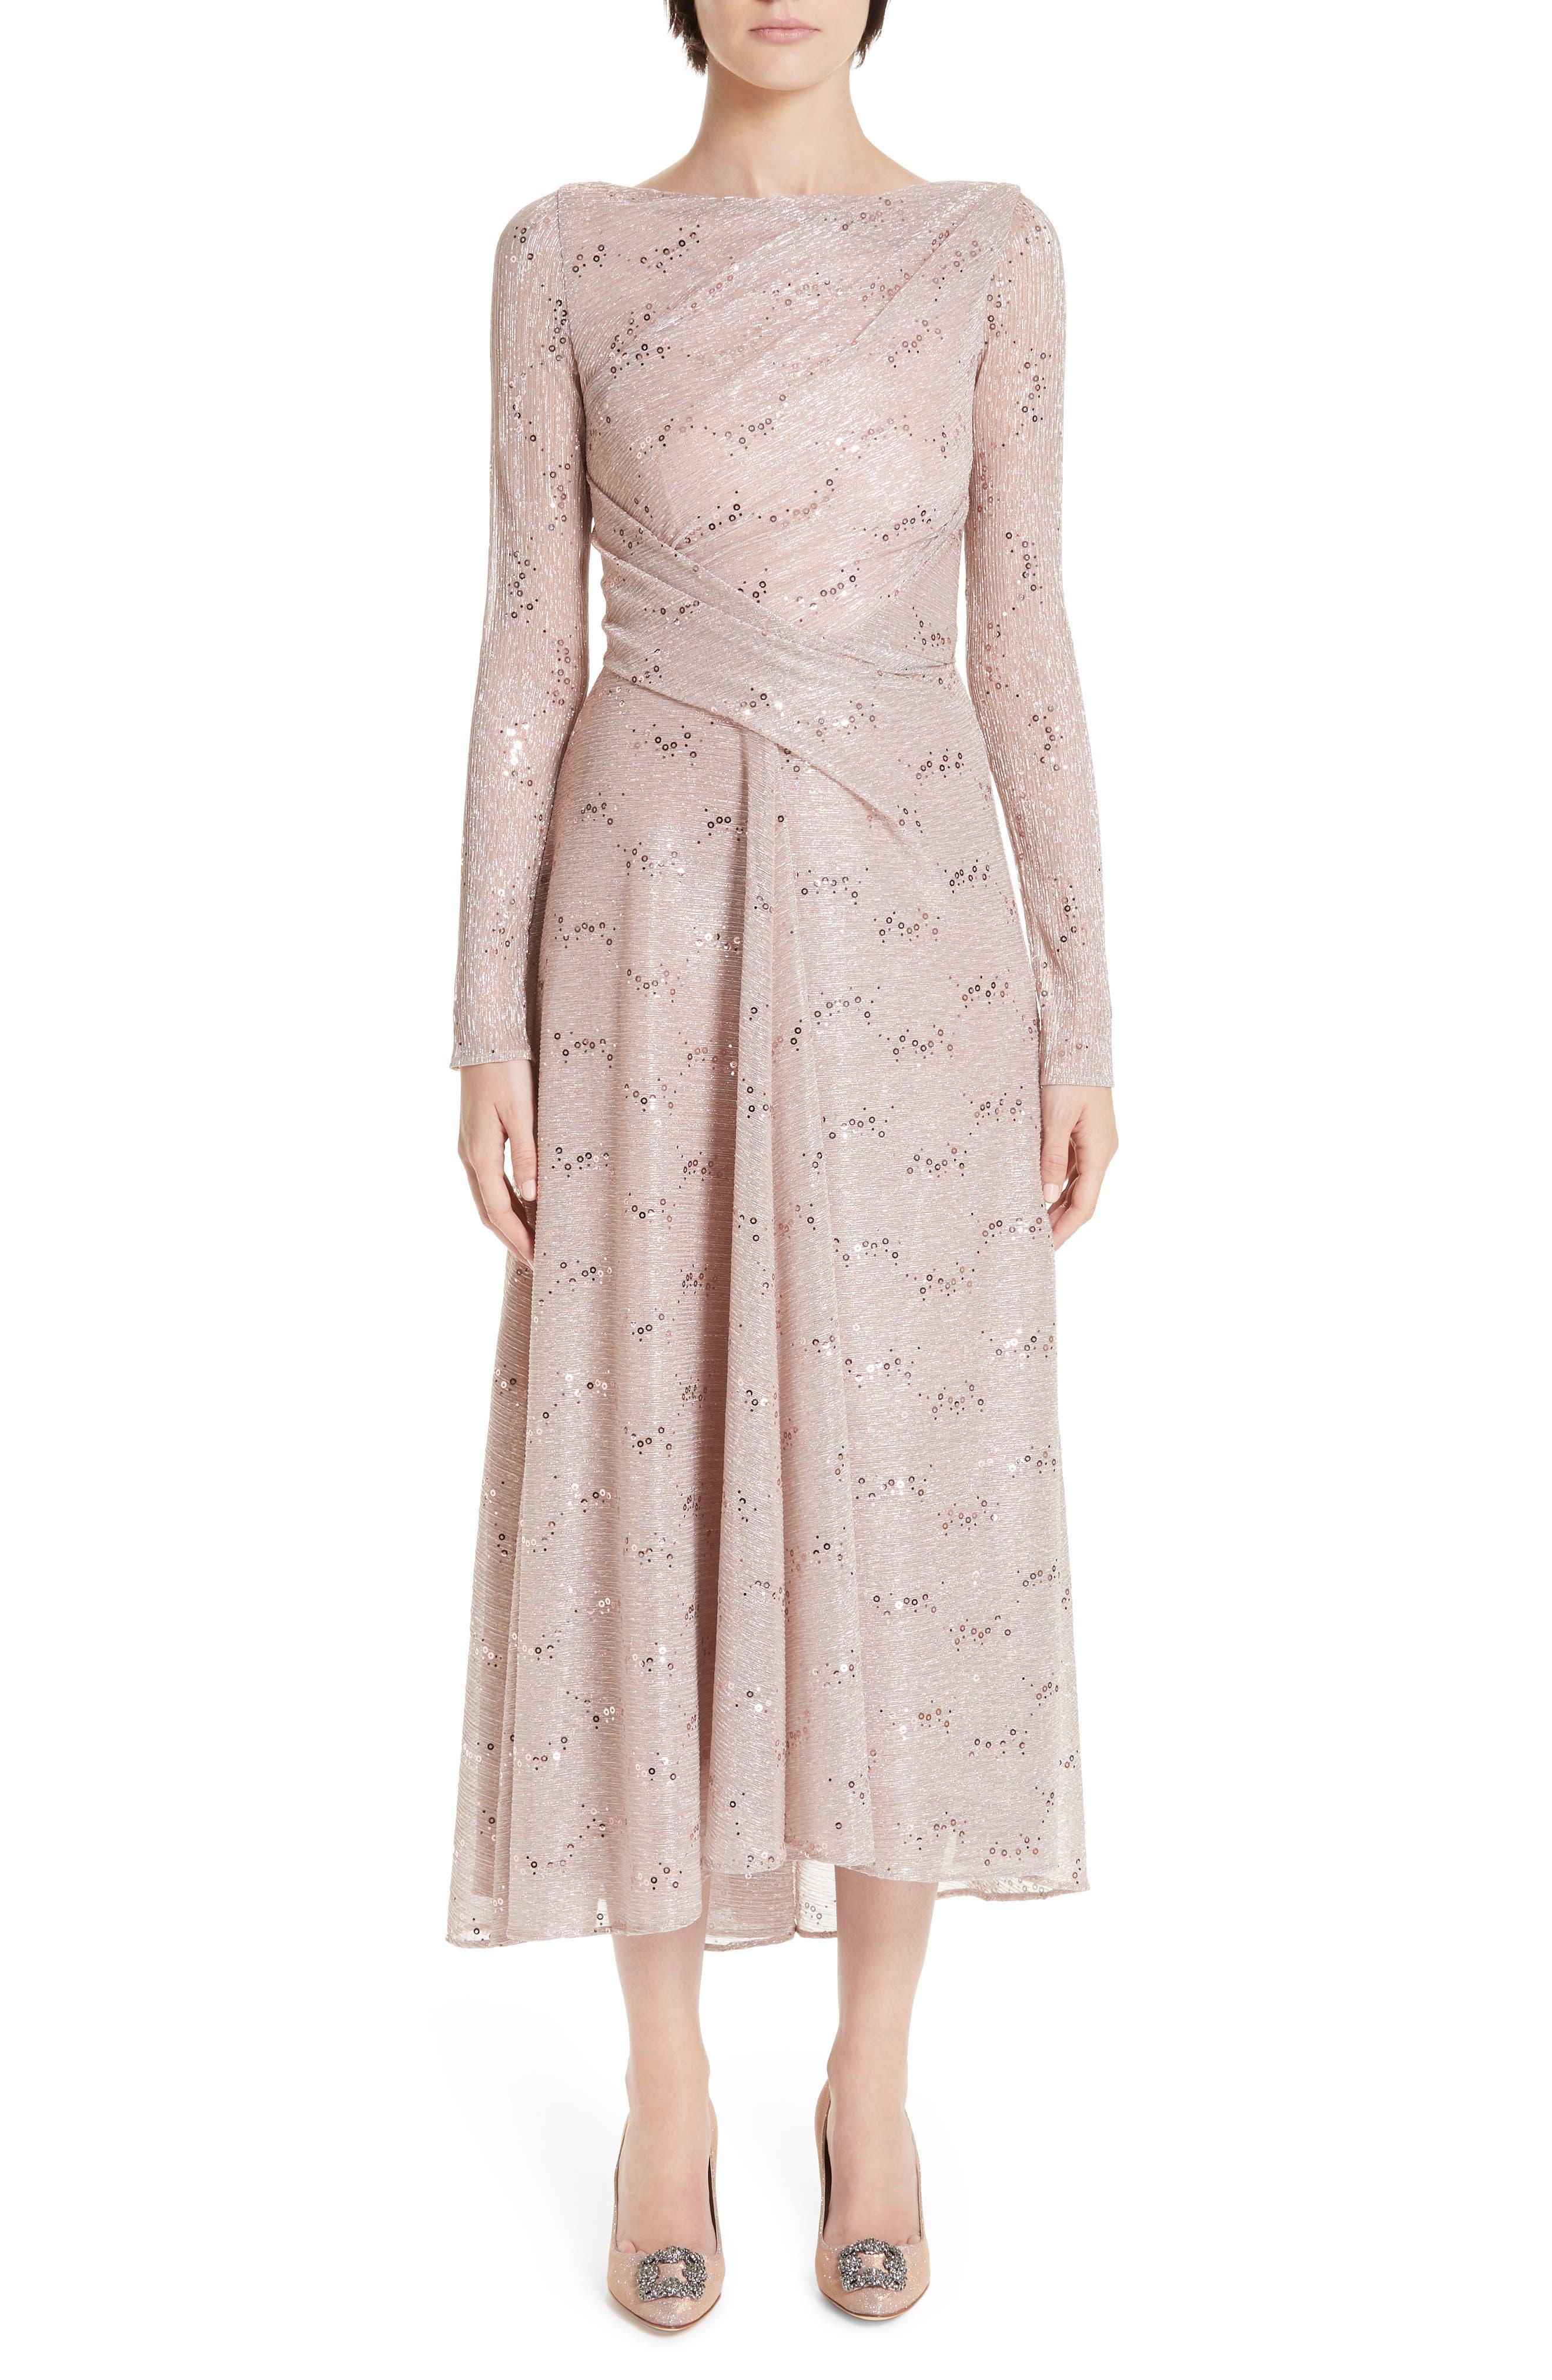 Talbot Runhof Sequin Metallic Voile Tea Length Dress, Pink